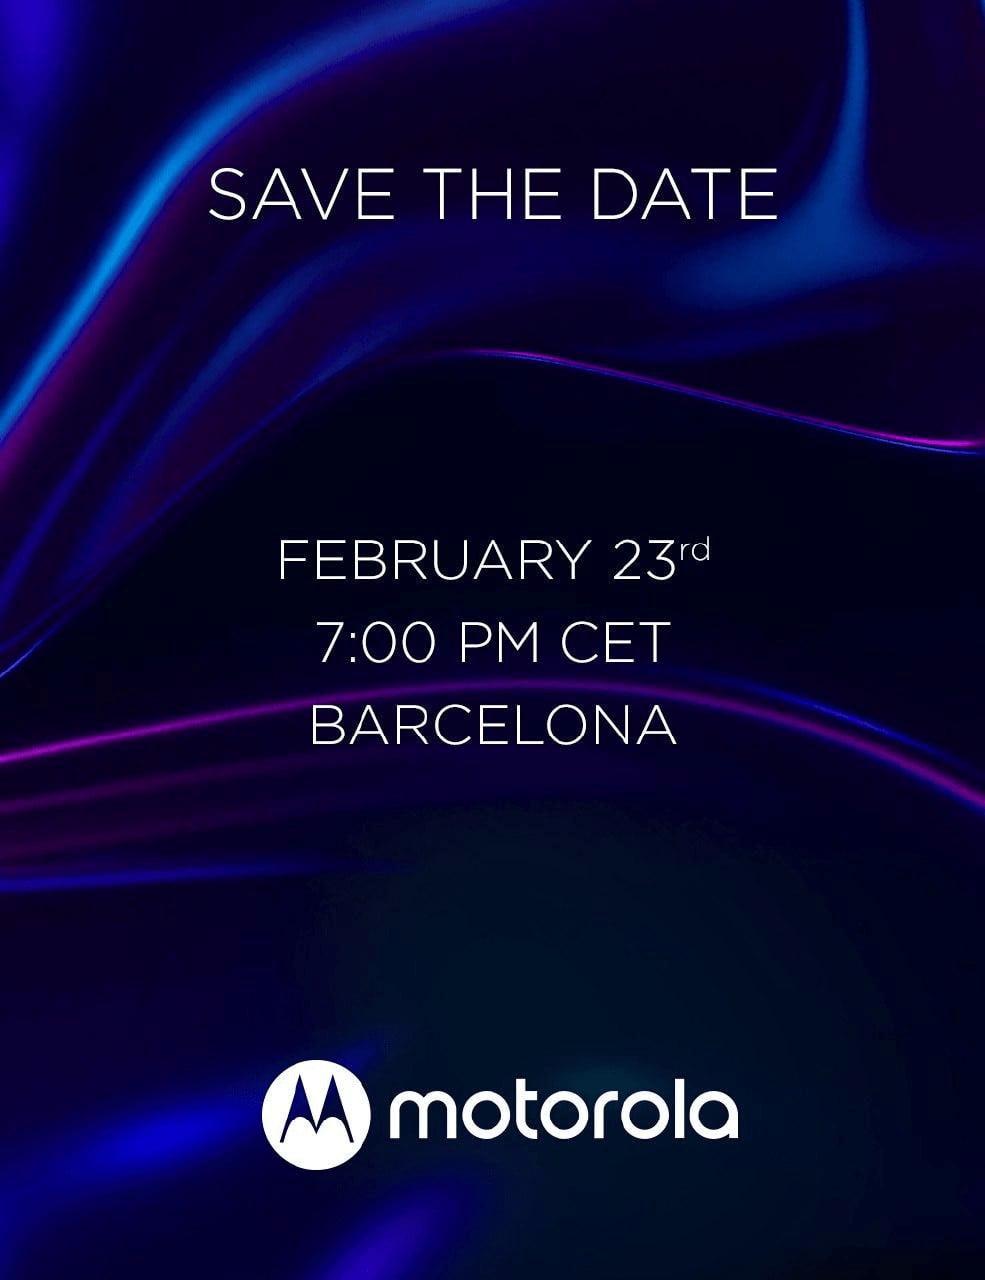 Motorola's February 23rd Event Invite